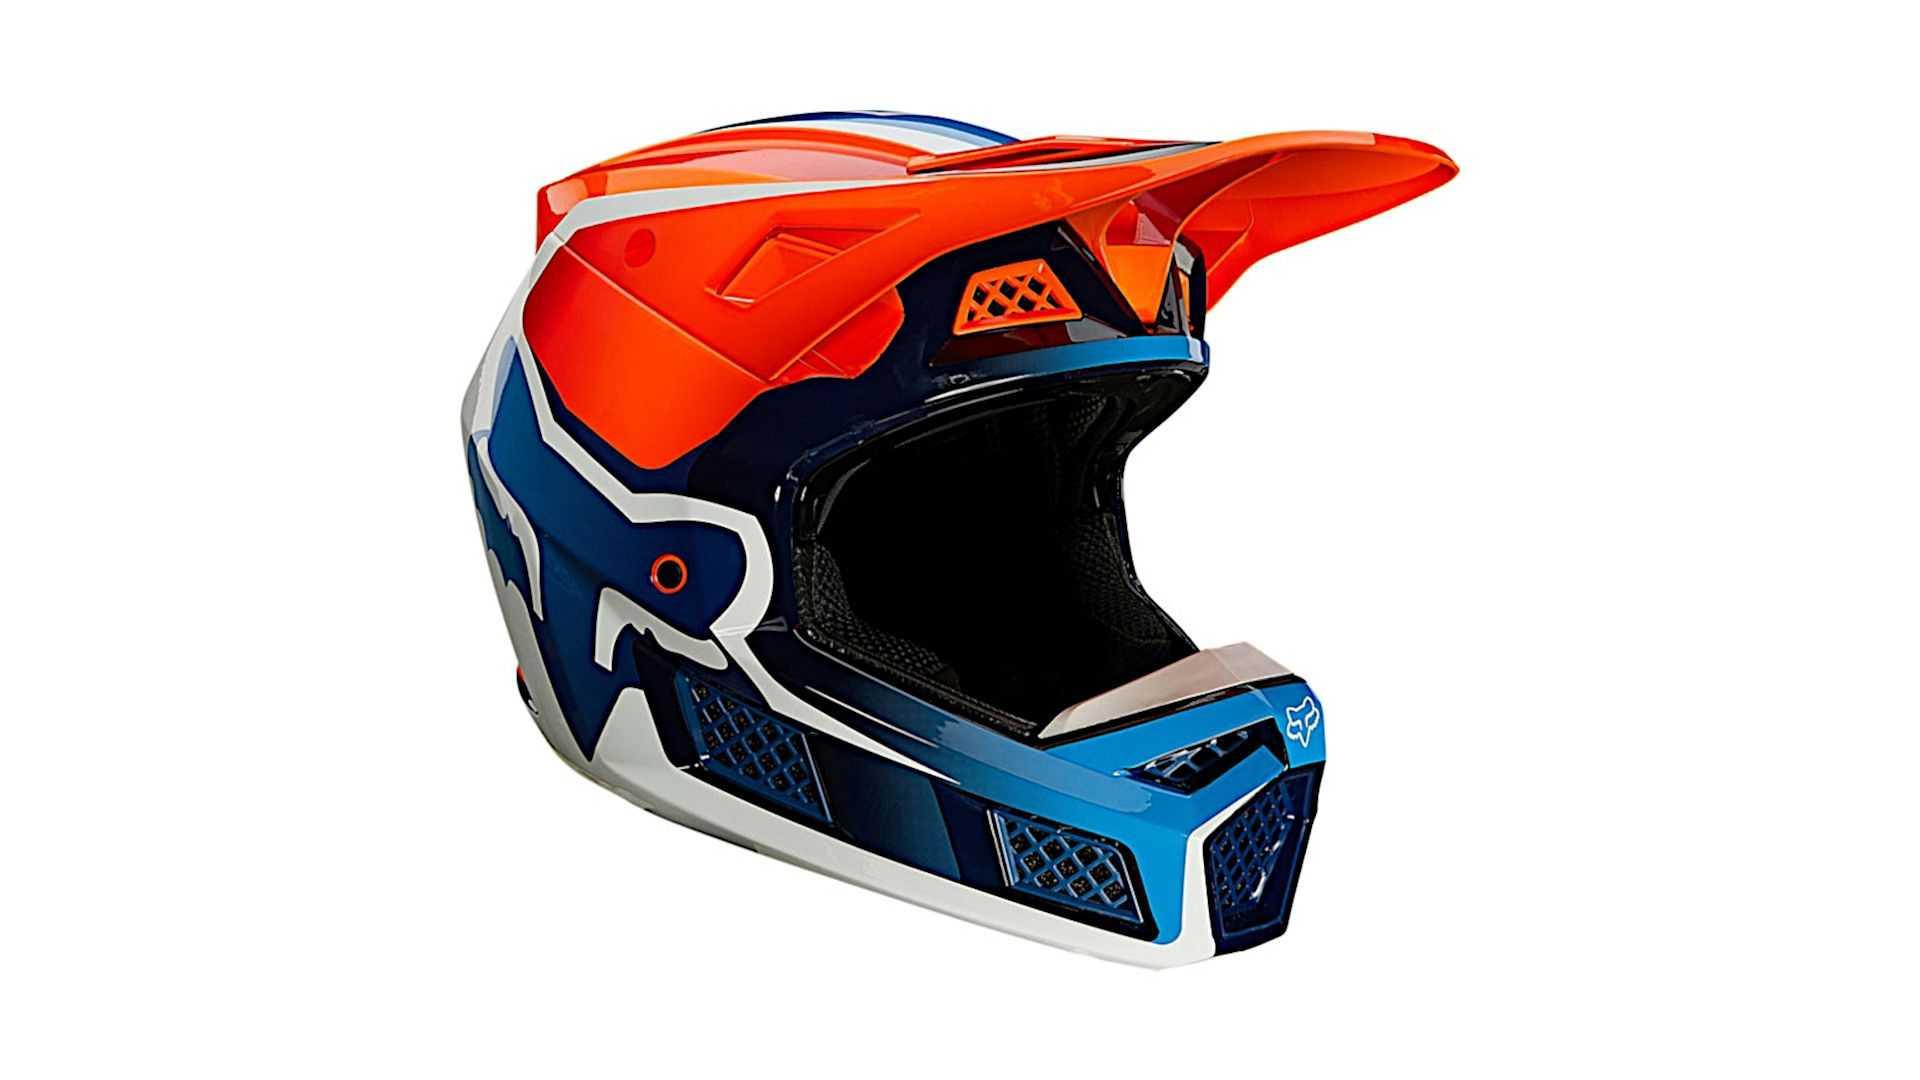 Fox Racing V3 Rs Wired Helmet Hits The Shelves Webbikeworld